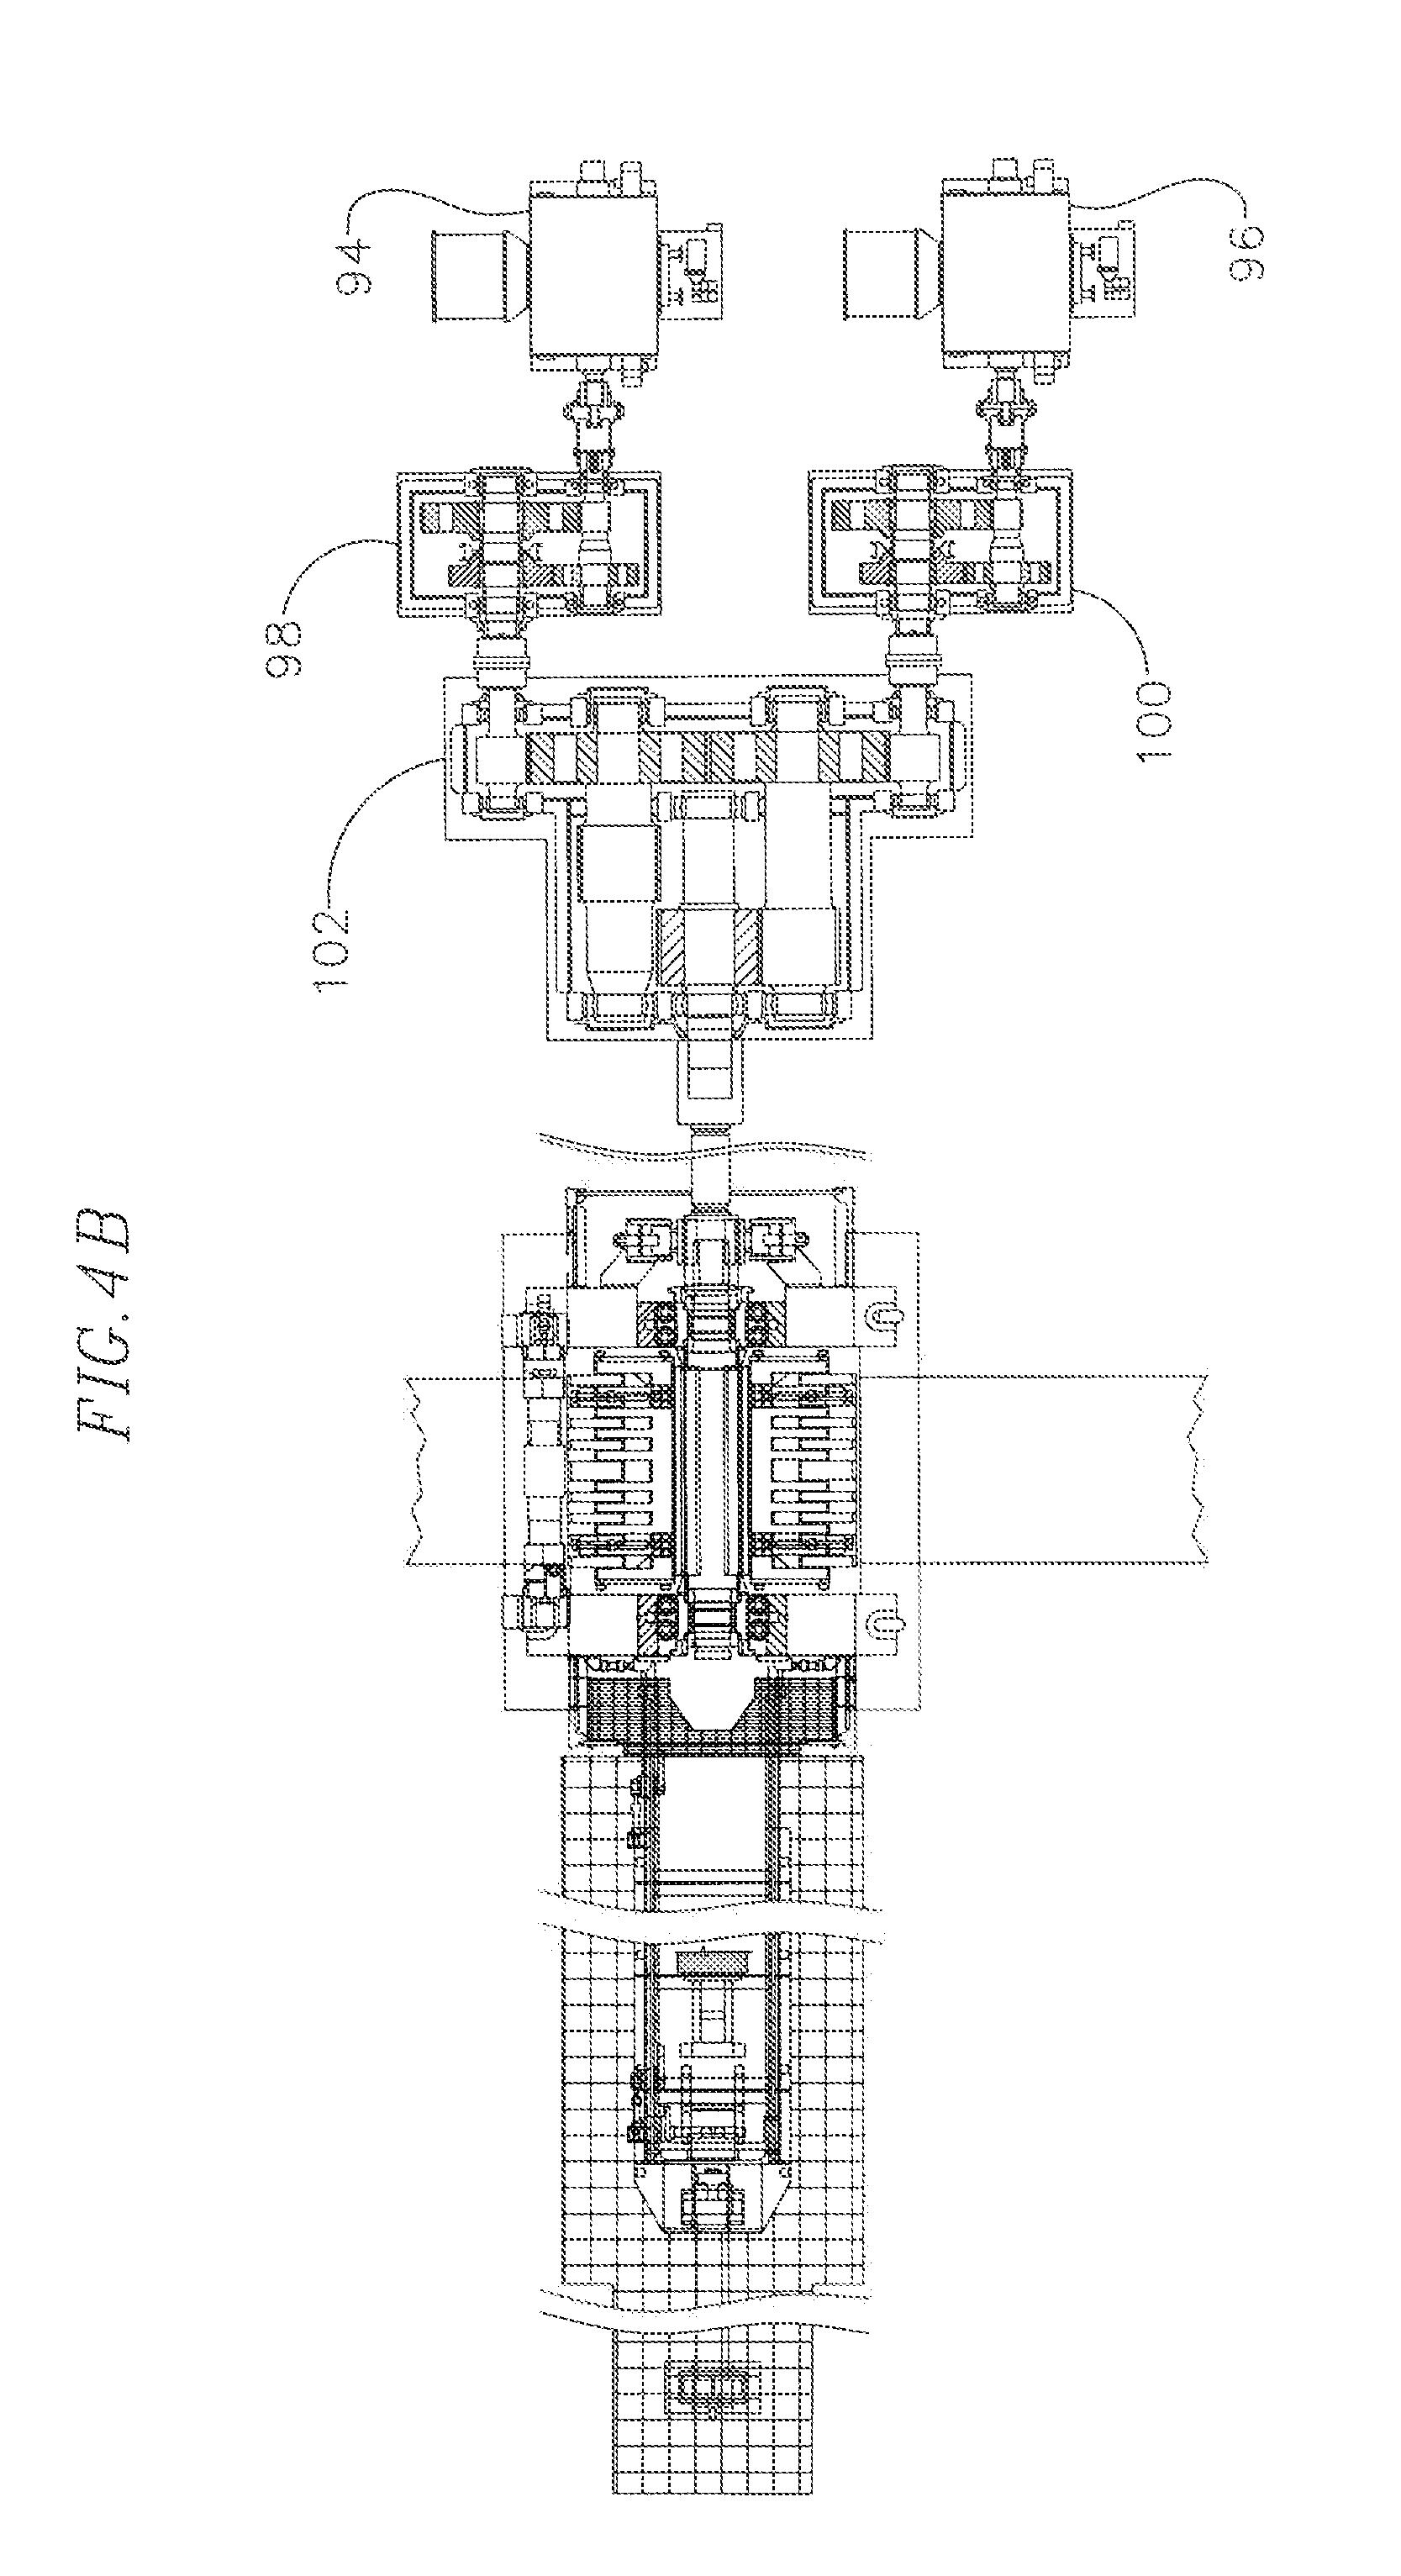 1996 suzuki king quad 300 wiring diagram wikishare patent us20120227455 magnesium roll mill google patents cobra omc wiring diagram suzuki alto vxr wiring cheapraybanclubmaster Choice Image